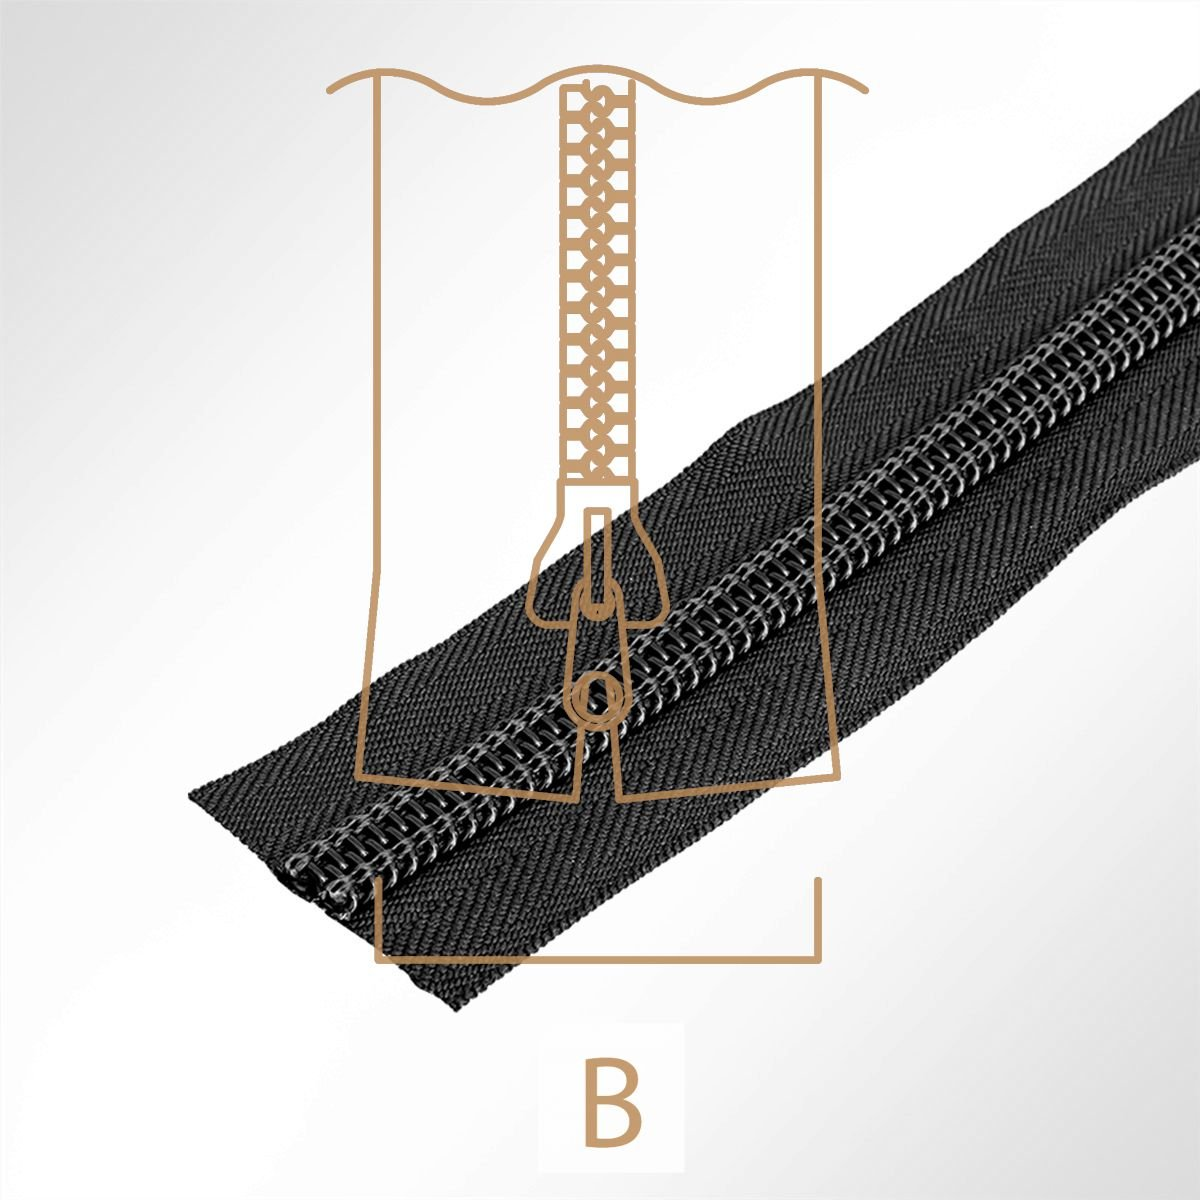 L/änge 70cm Spiral wei/ß teilbar YKK/® 10C Rei/ßverschluss Zeltreisser Spiralrei/ßverschluss